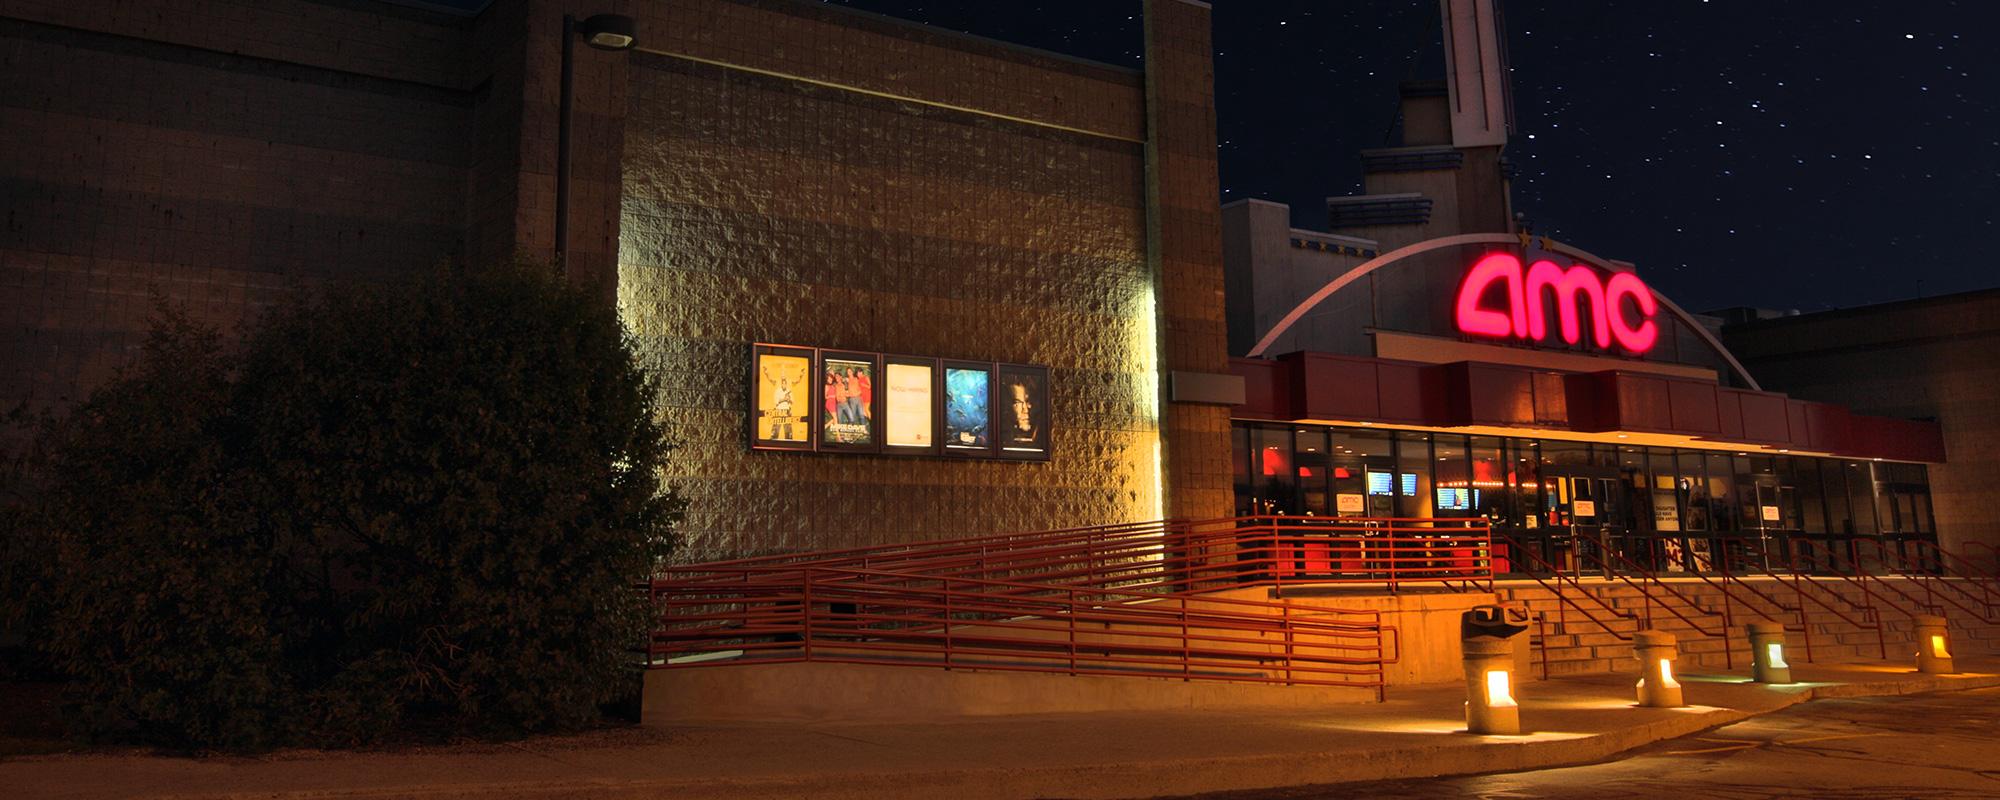 AMC Braintree 10 - Braintree, Massachusetts 02184 - AMC Theatres